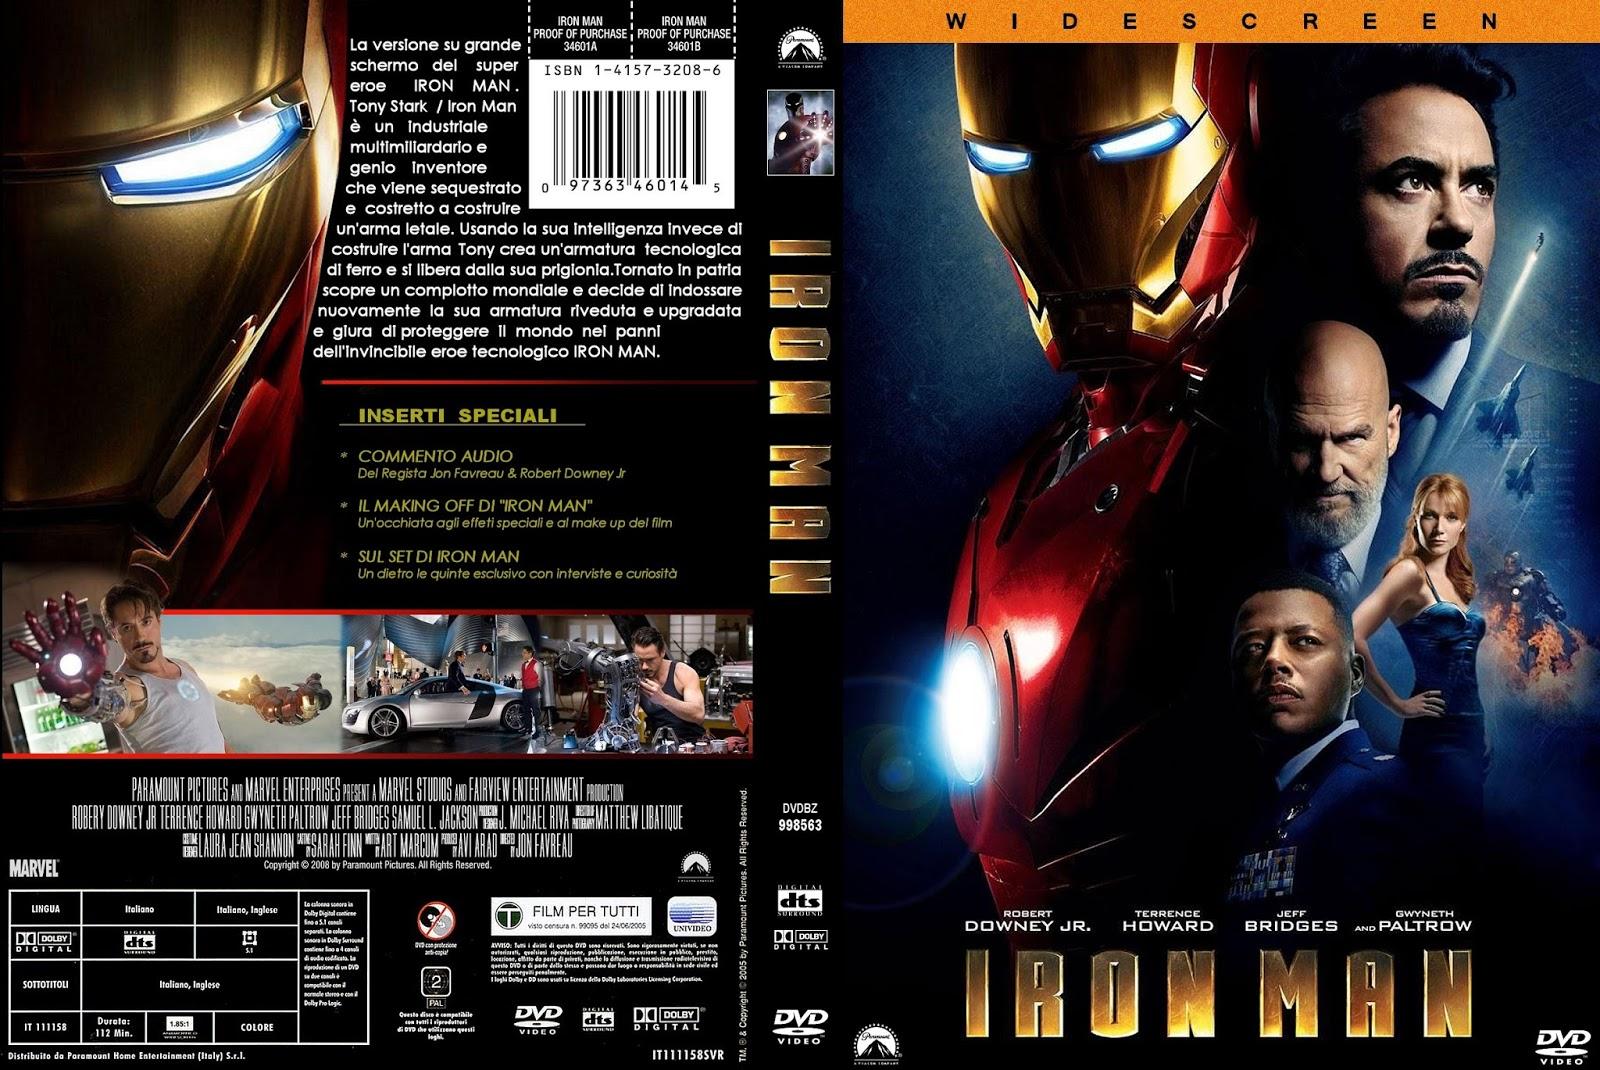 iron man123brrip 1080paudio duallateng identi